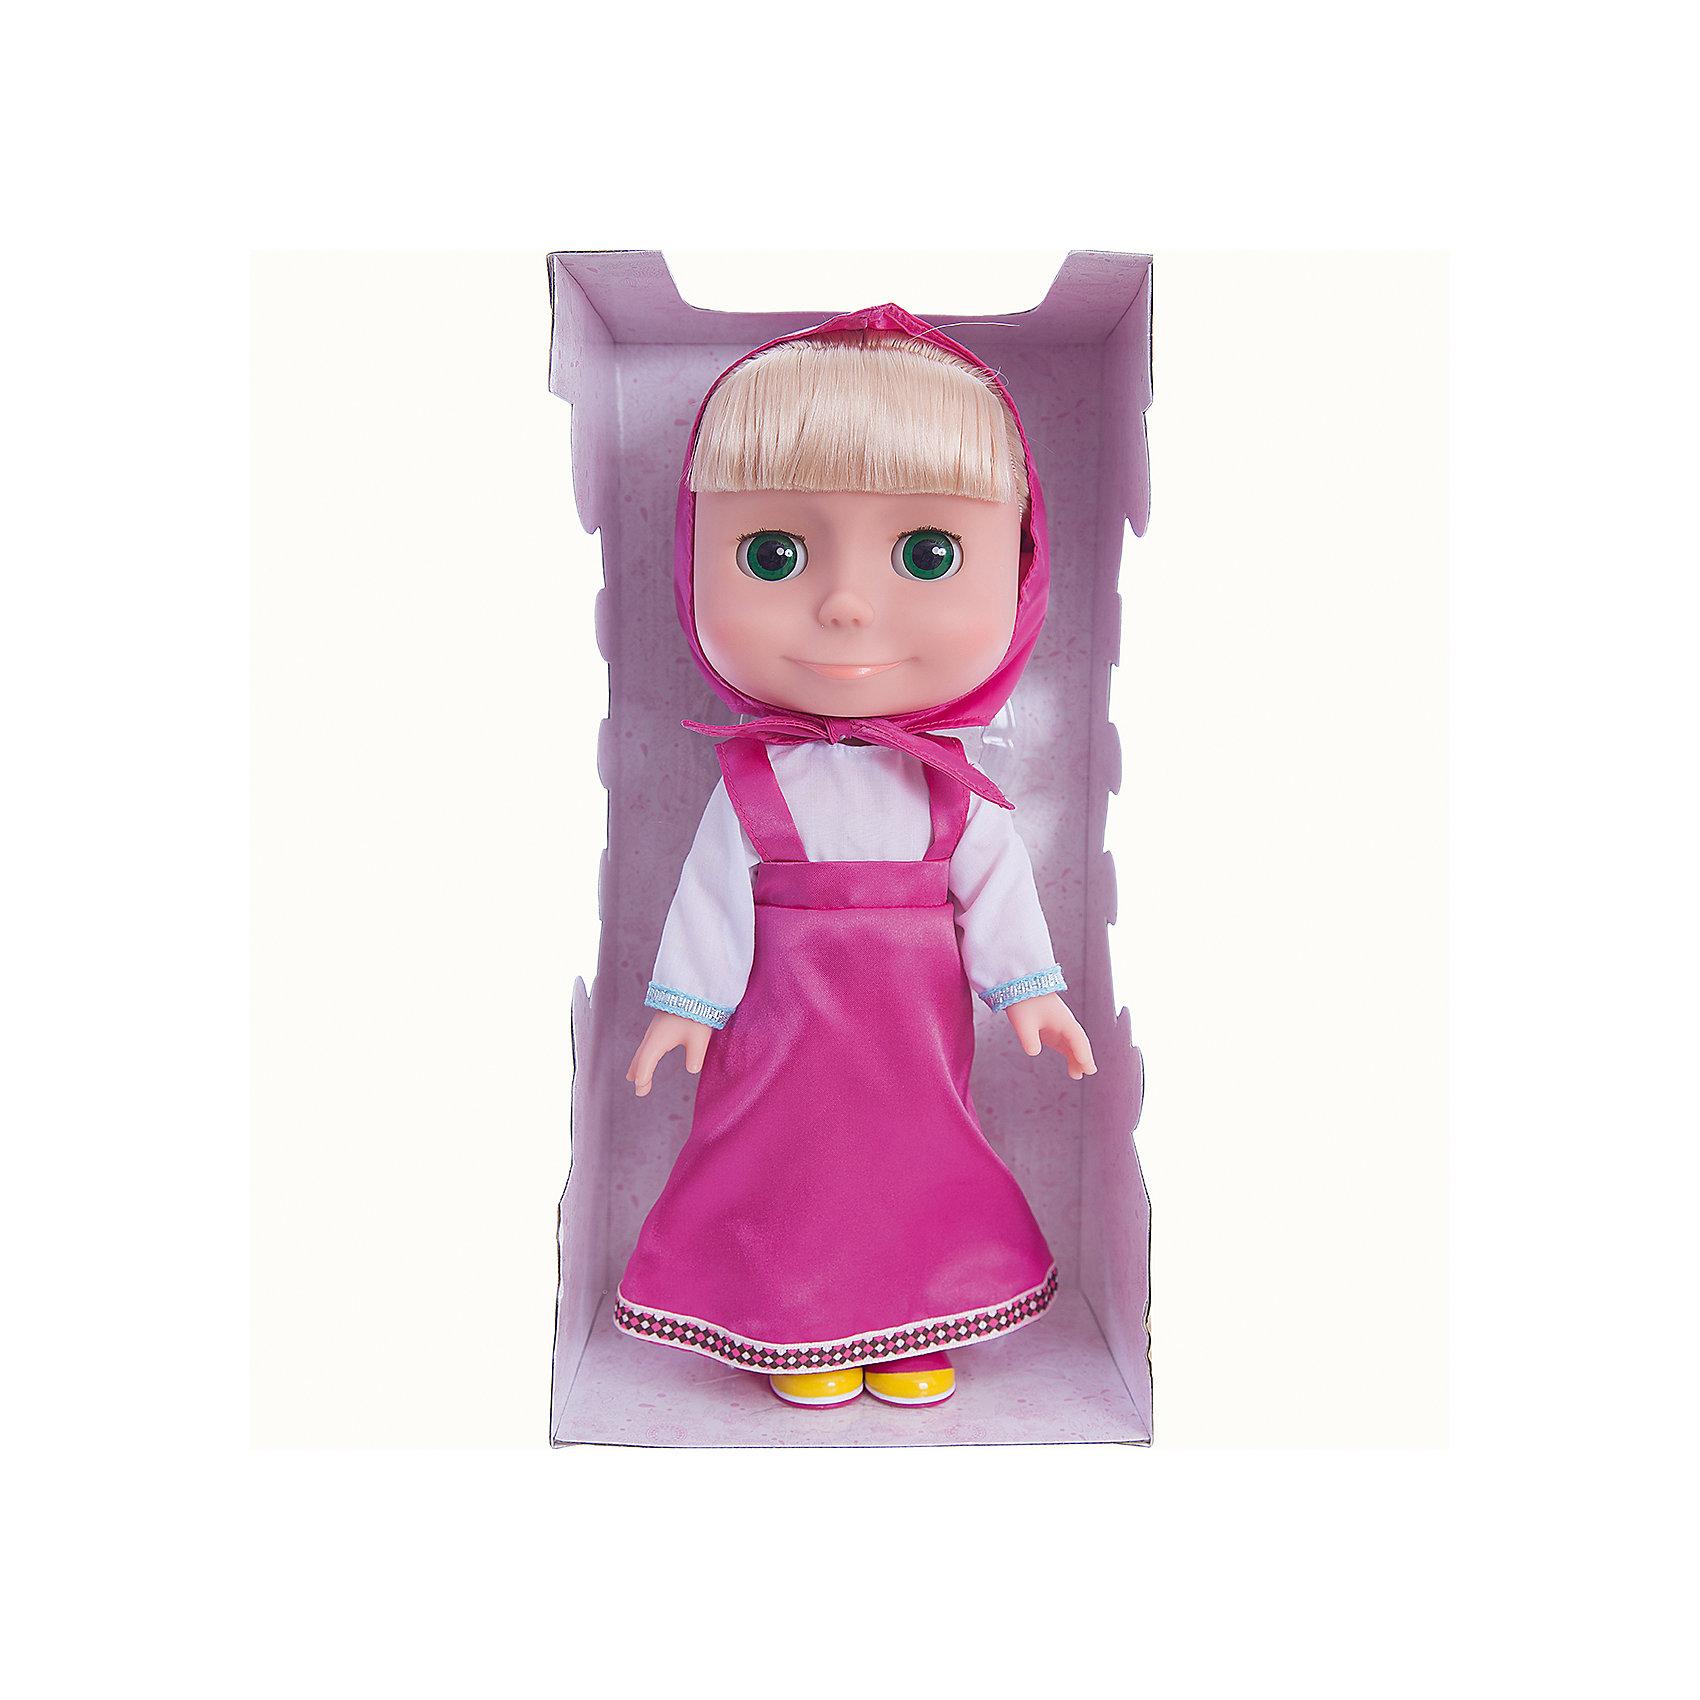 Карапуз Кукла Маша, Маша и Медведь, 33 см, Карапуз карапуз кукла золушка со светящимся амулетом 37 см со звуком принцессы дисней карапуз